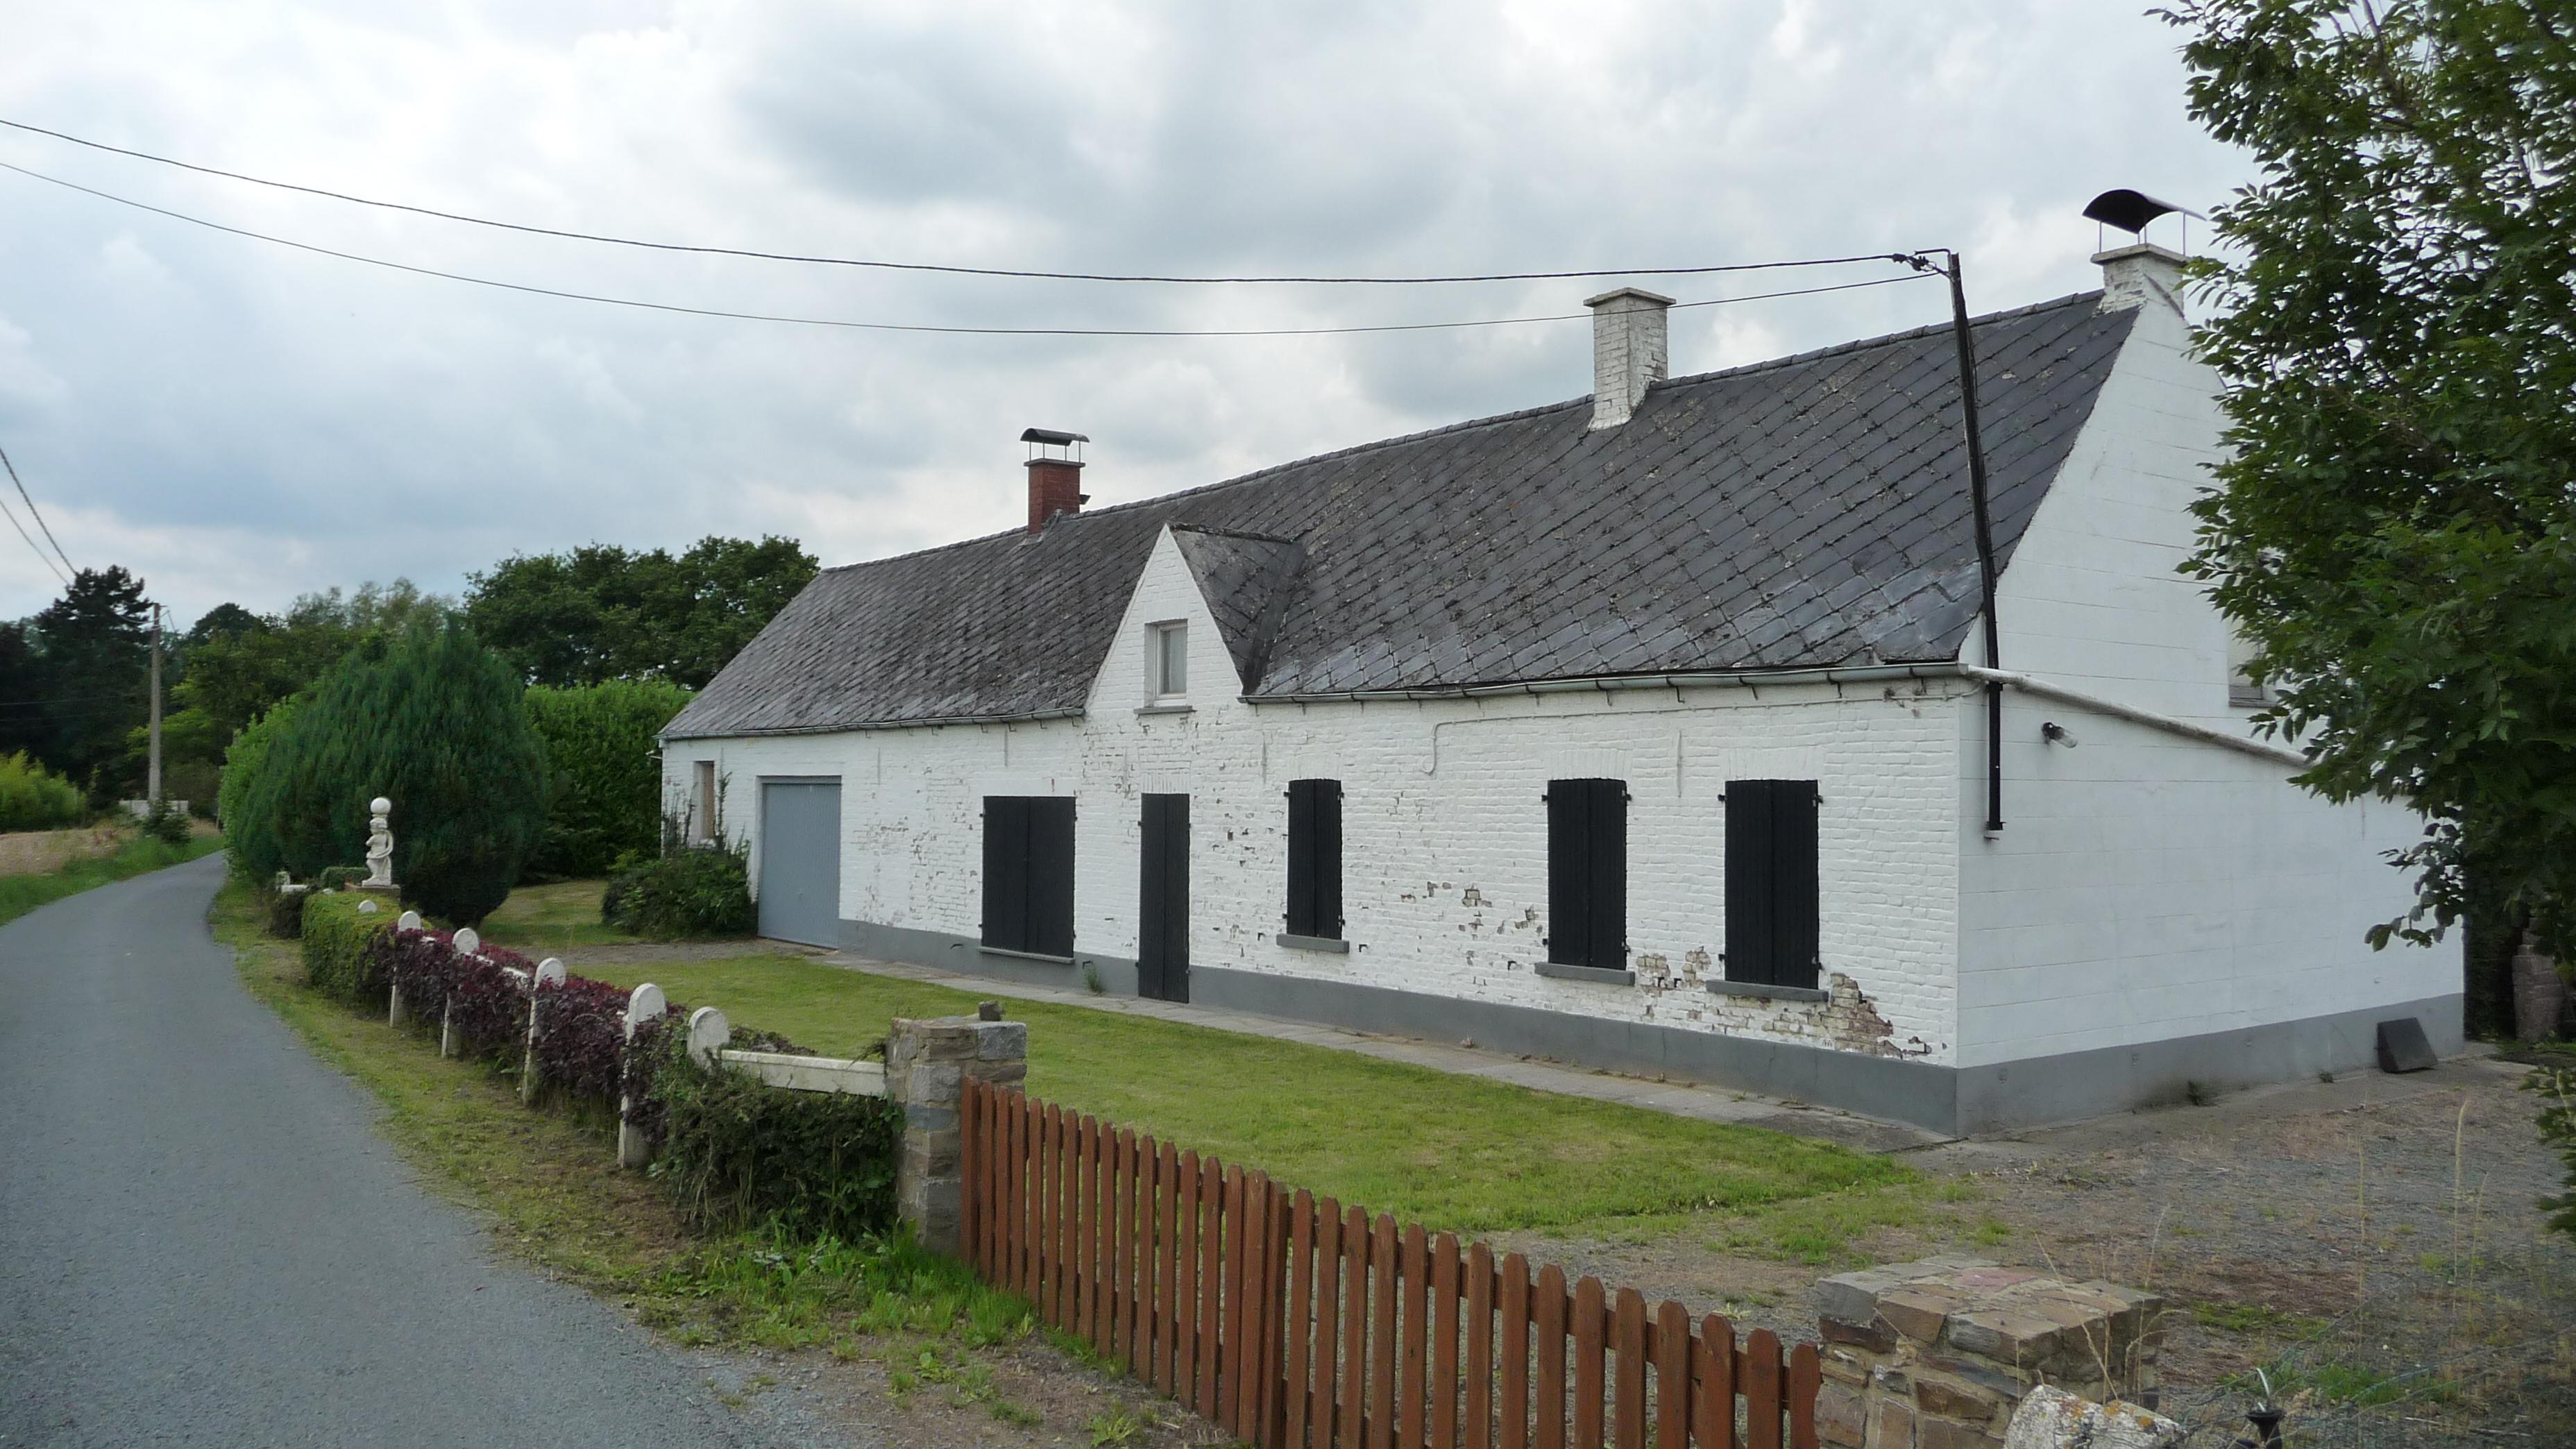 House in Frasnes-les-Anvaing